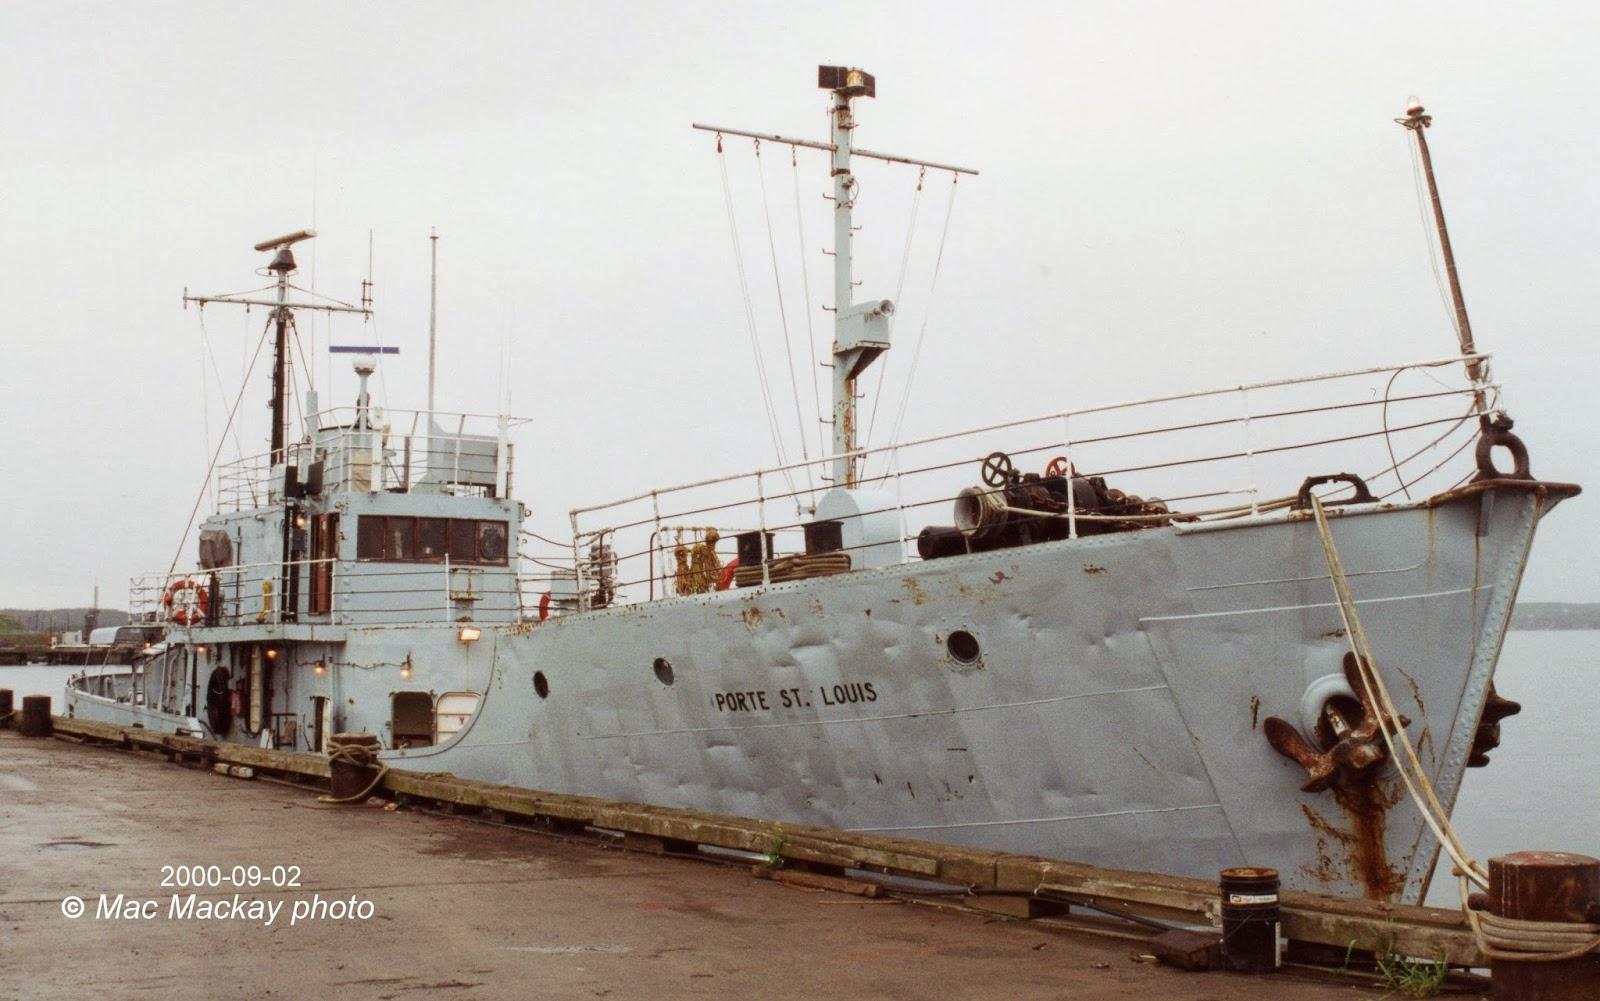 Porte class gate vessels for Porte st louis